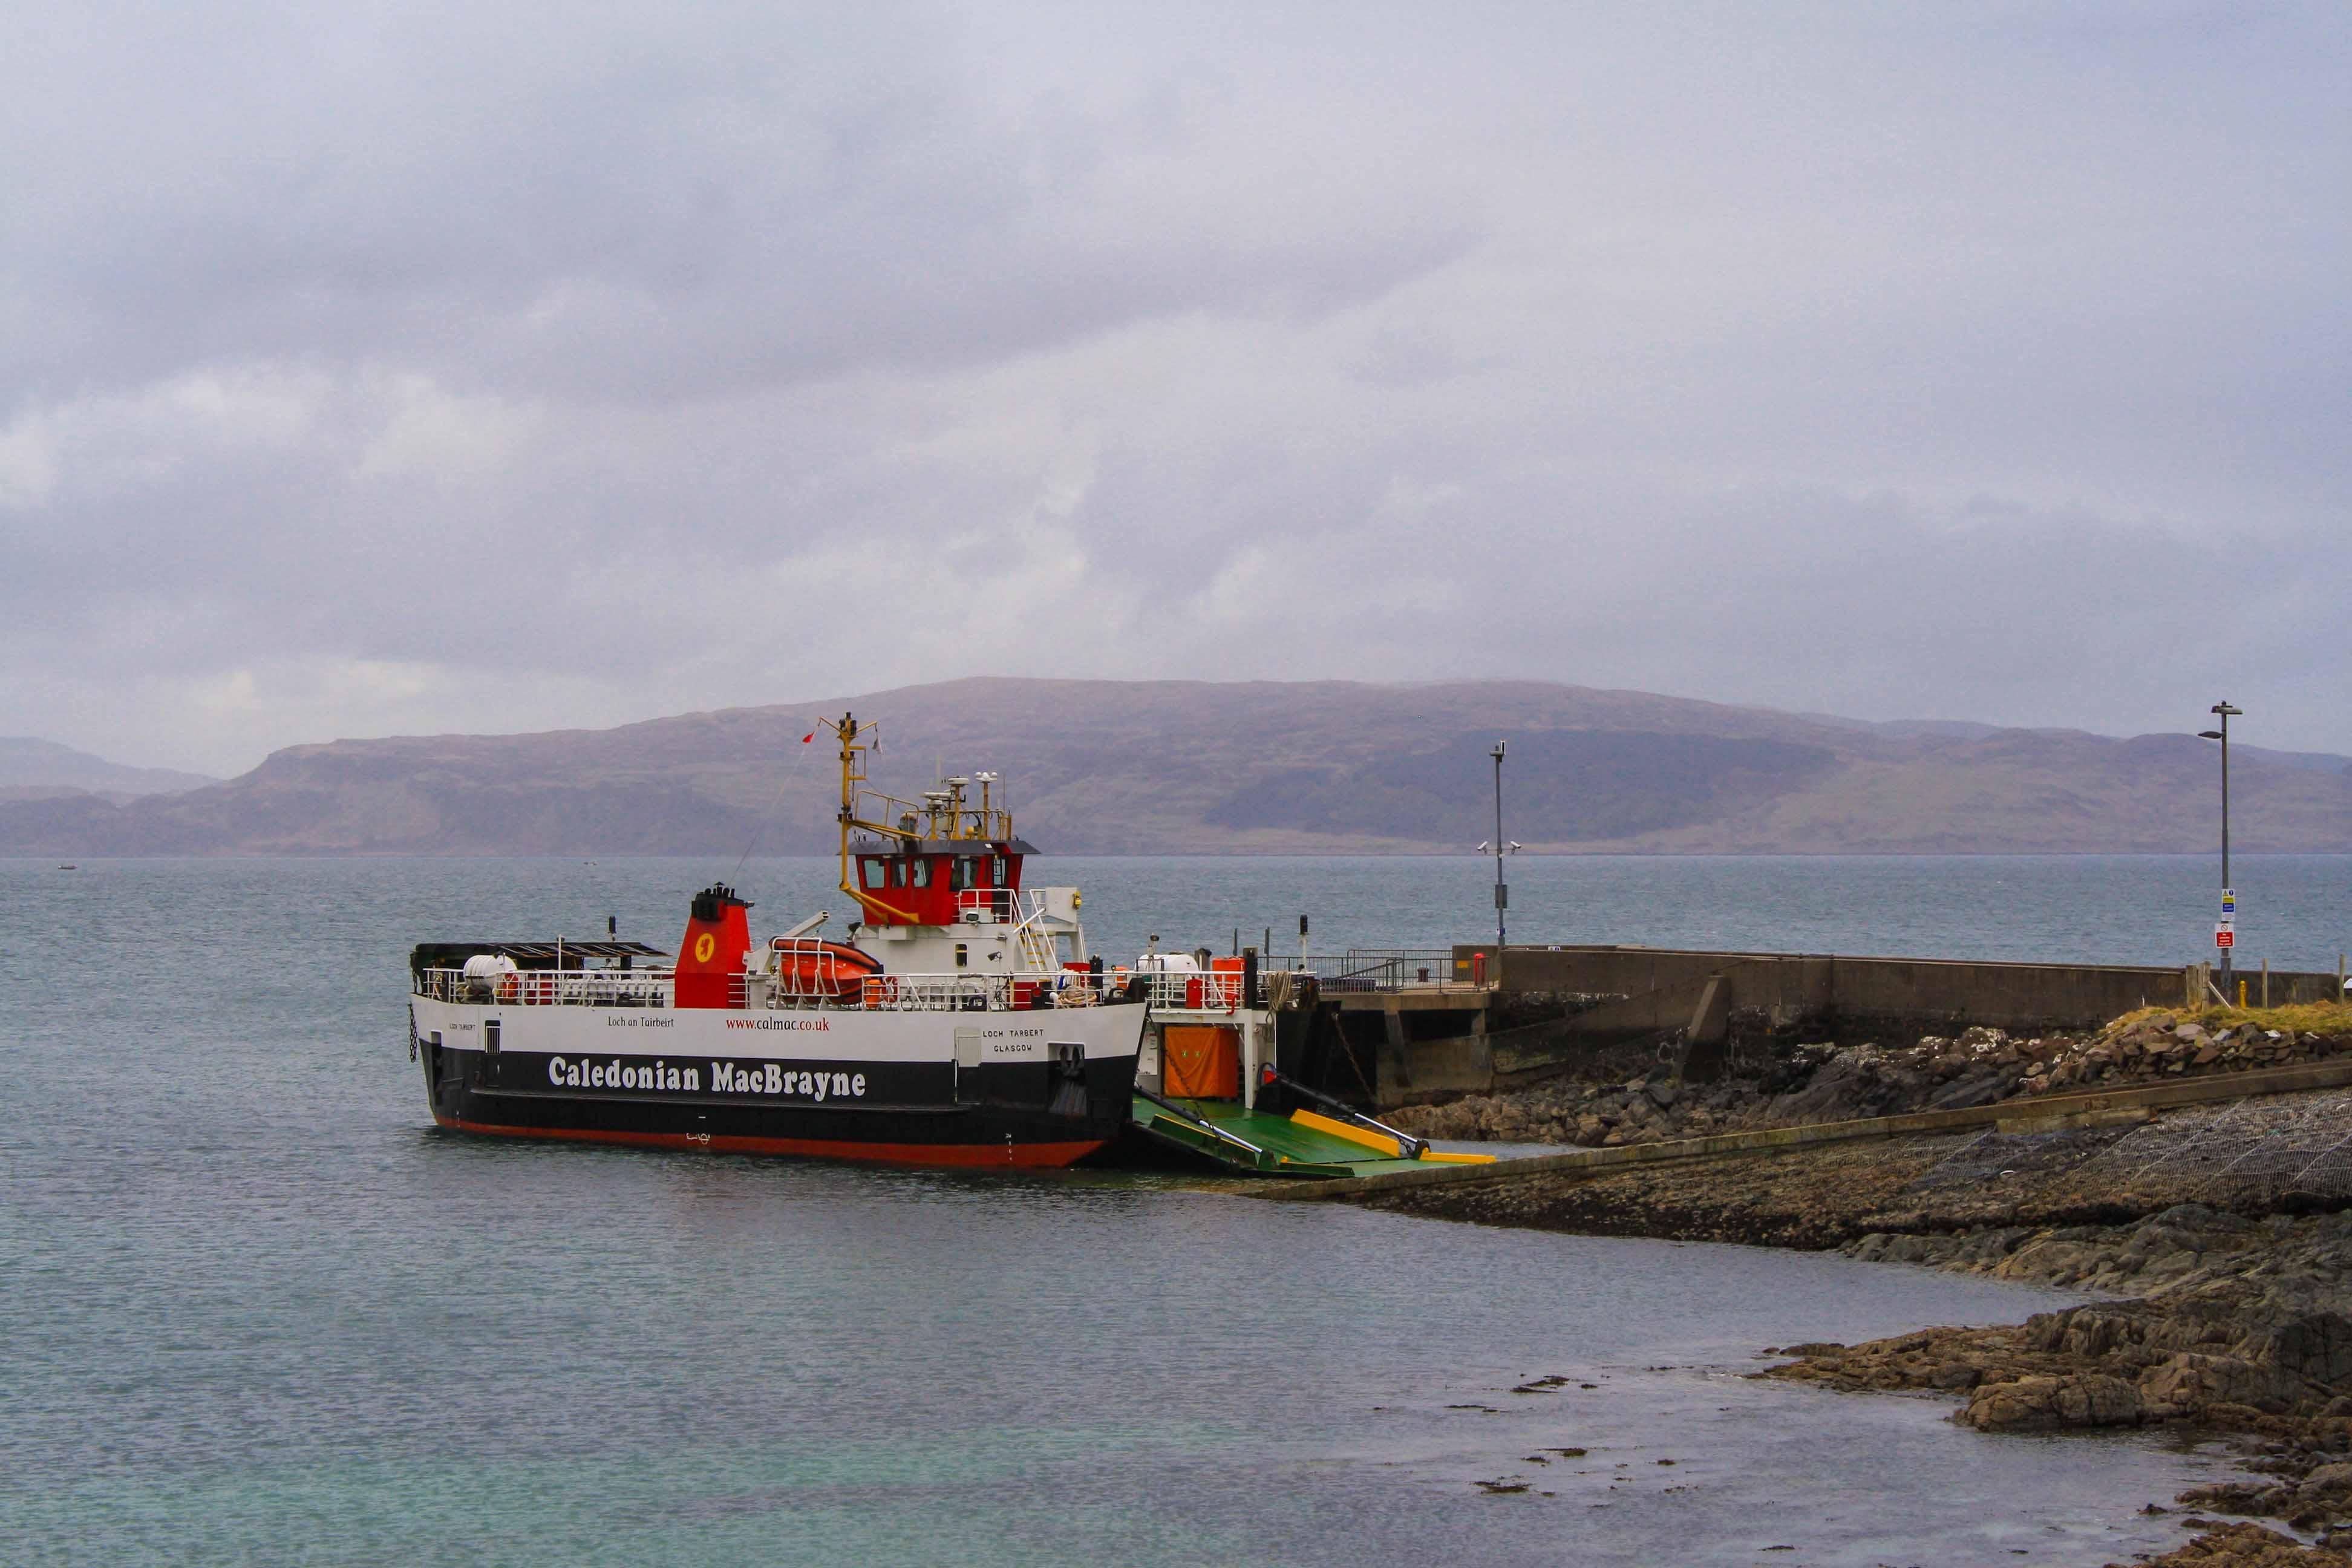 Loch Tarbert at Kilchoan (Ships of CalMac)